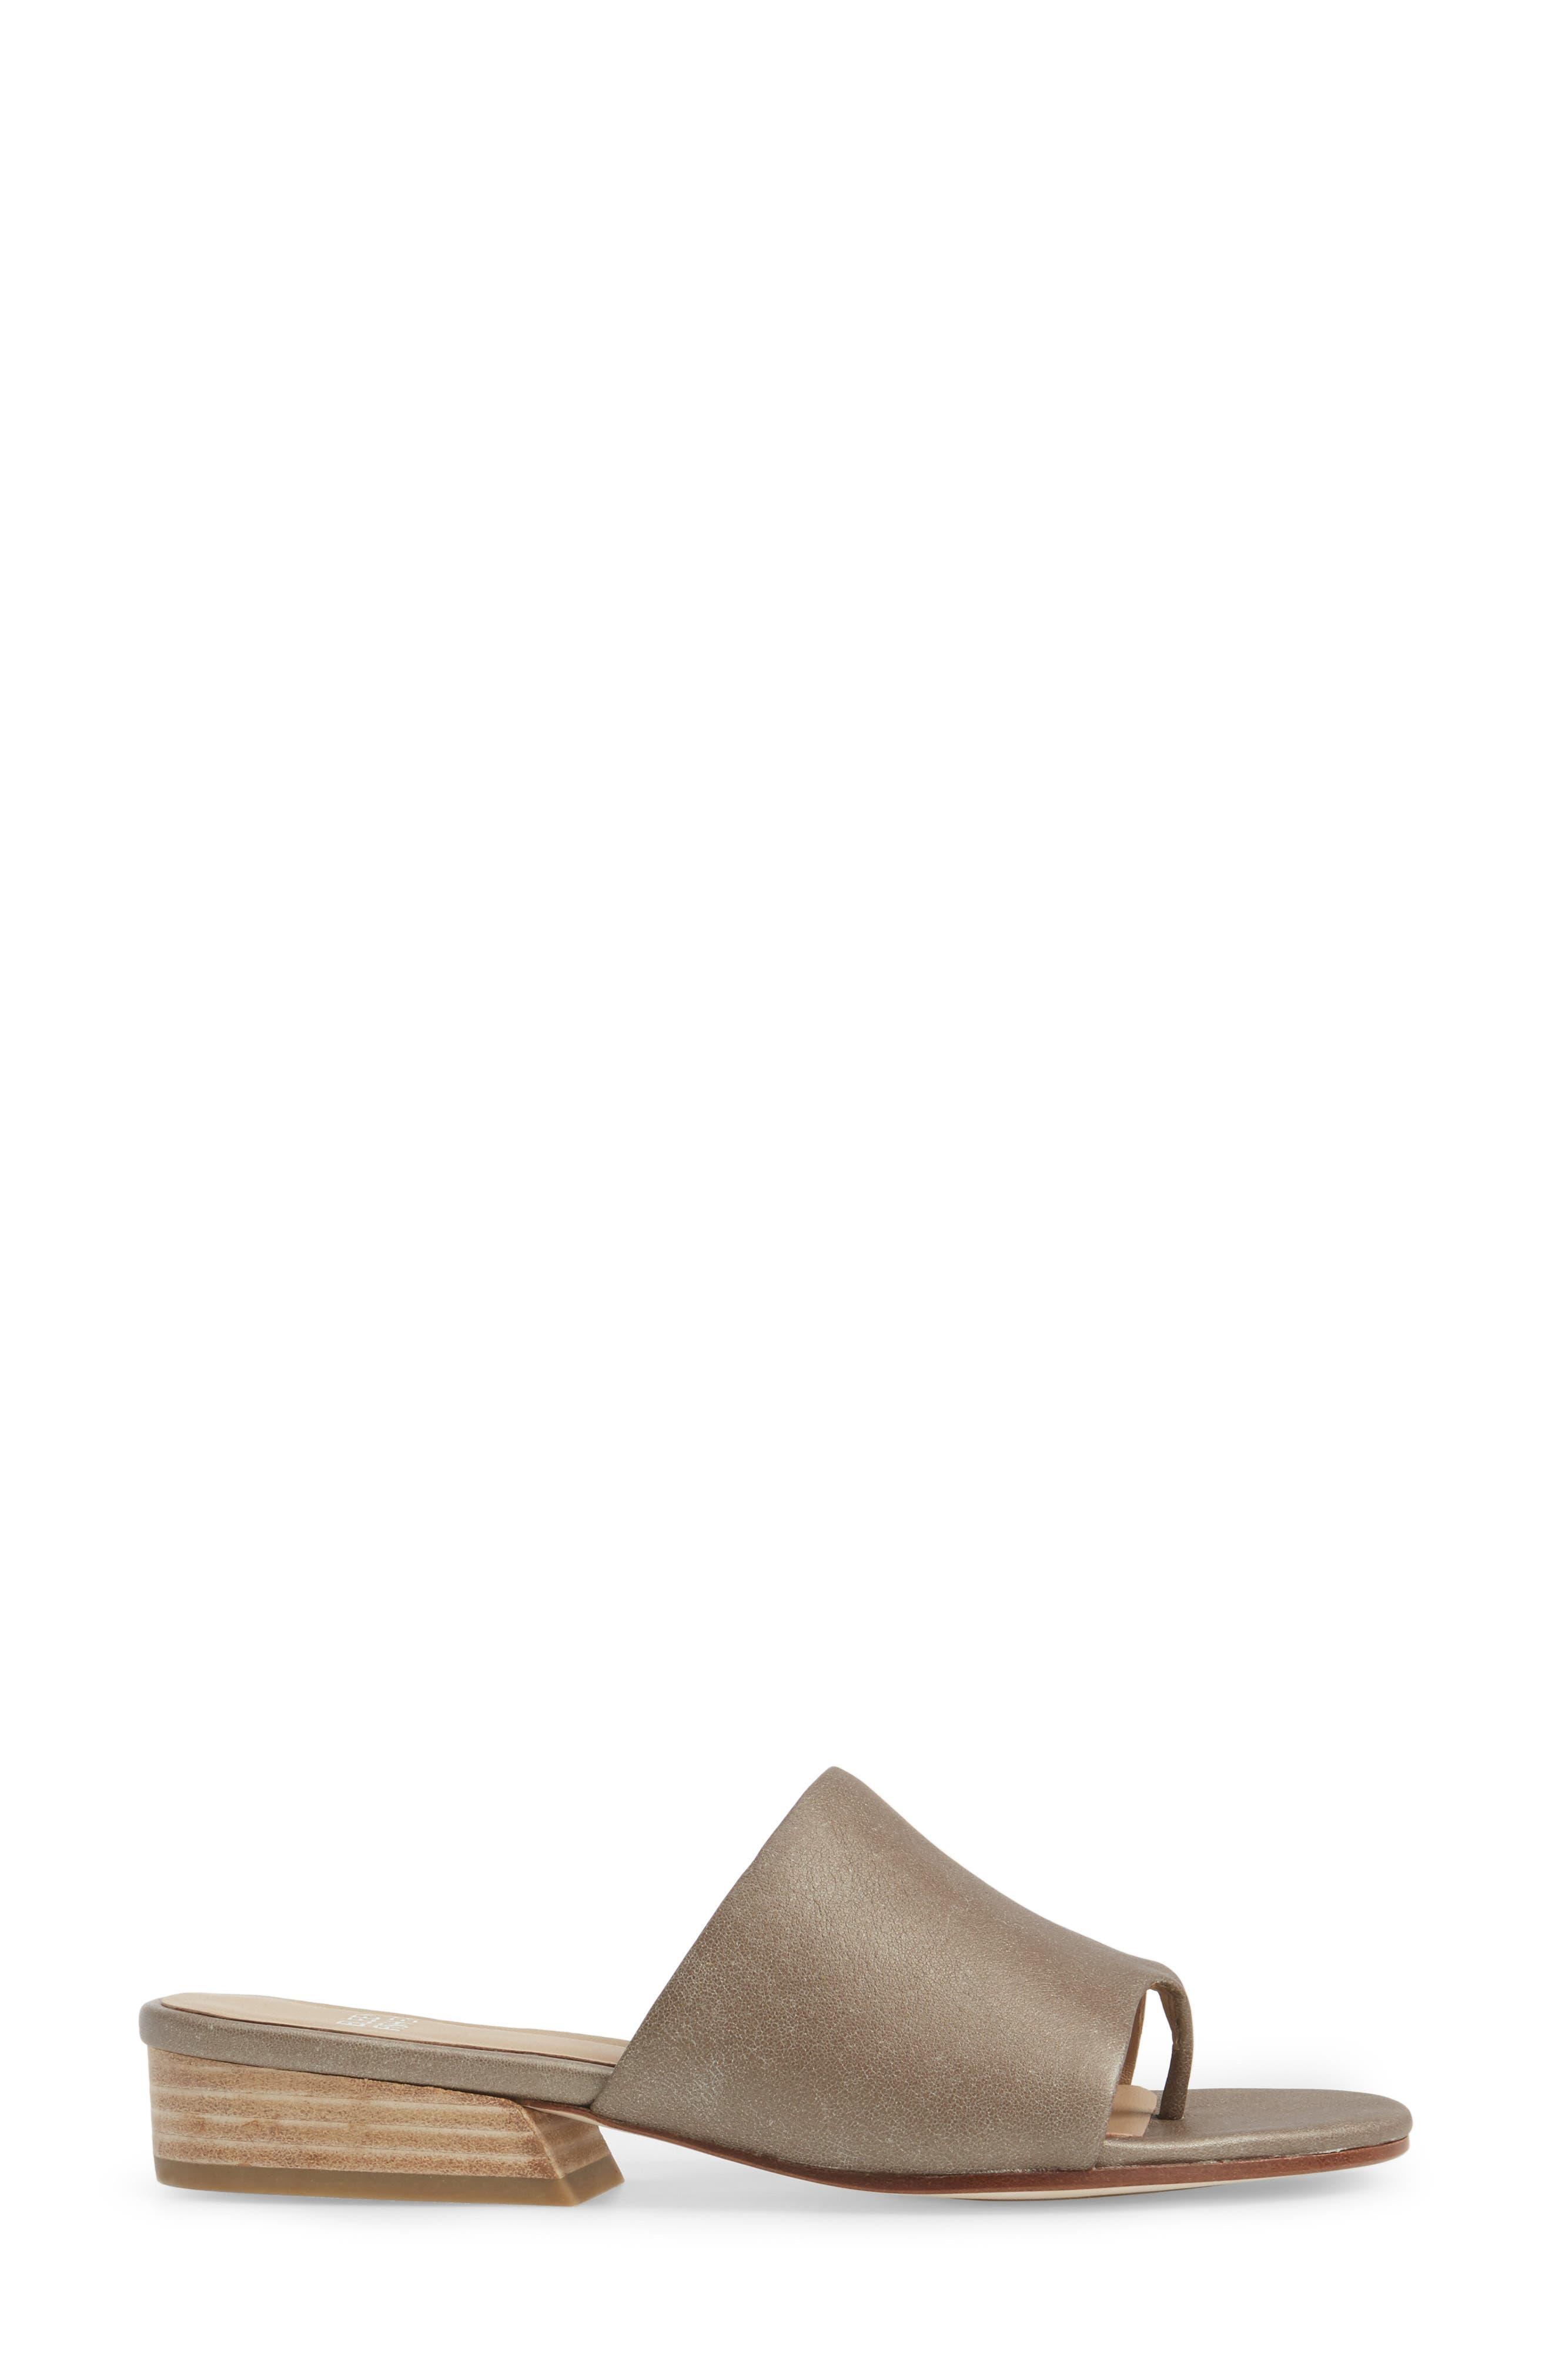 Beal Slide Sandal,                             Alternate thumbnail 3, color,                             Pyrite Leather